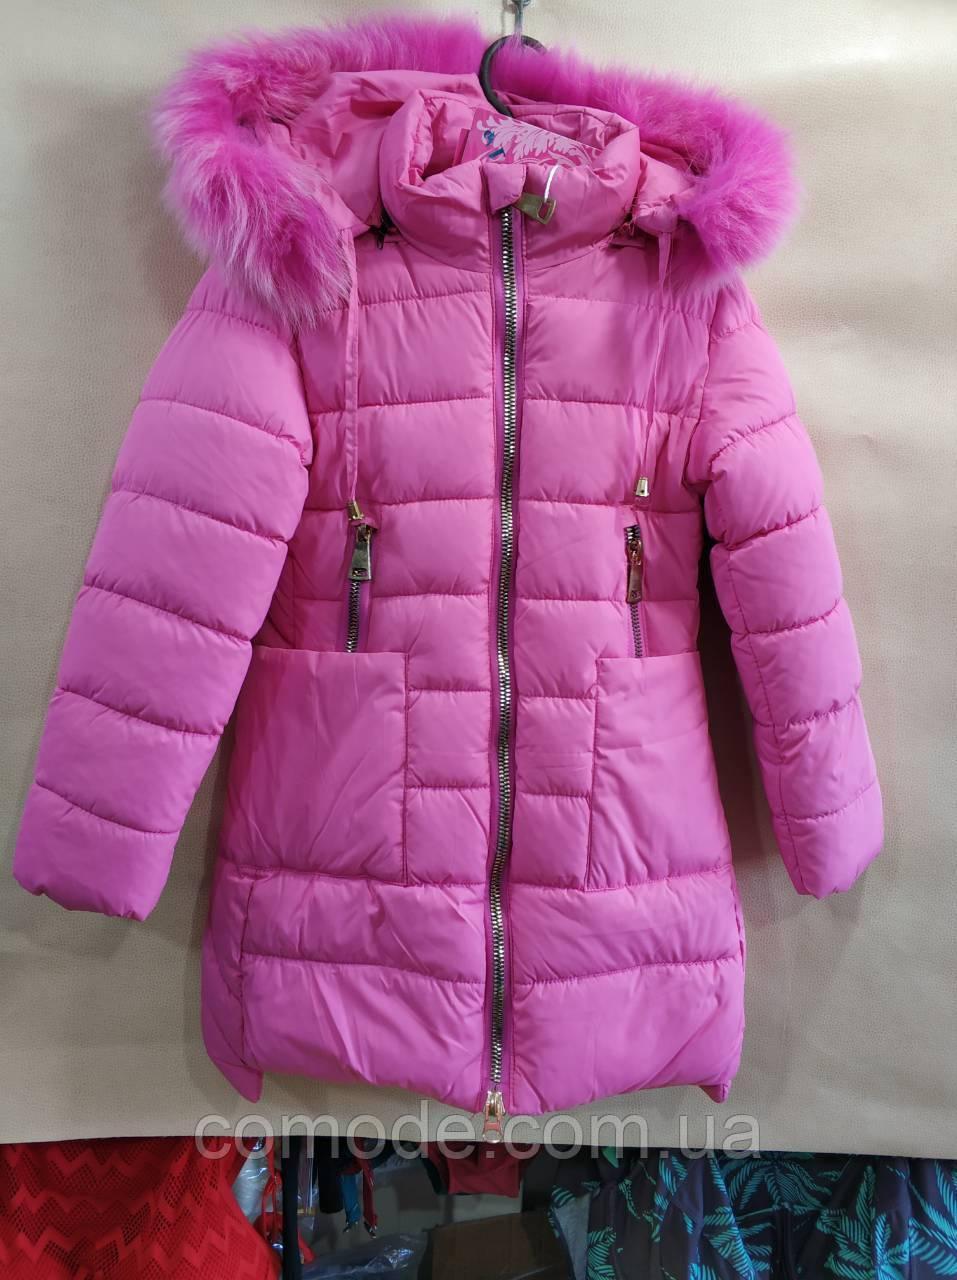 Куртка зимняя на девочку